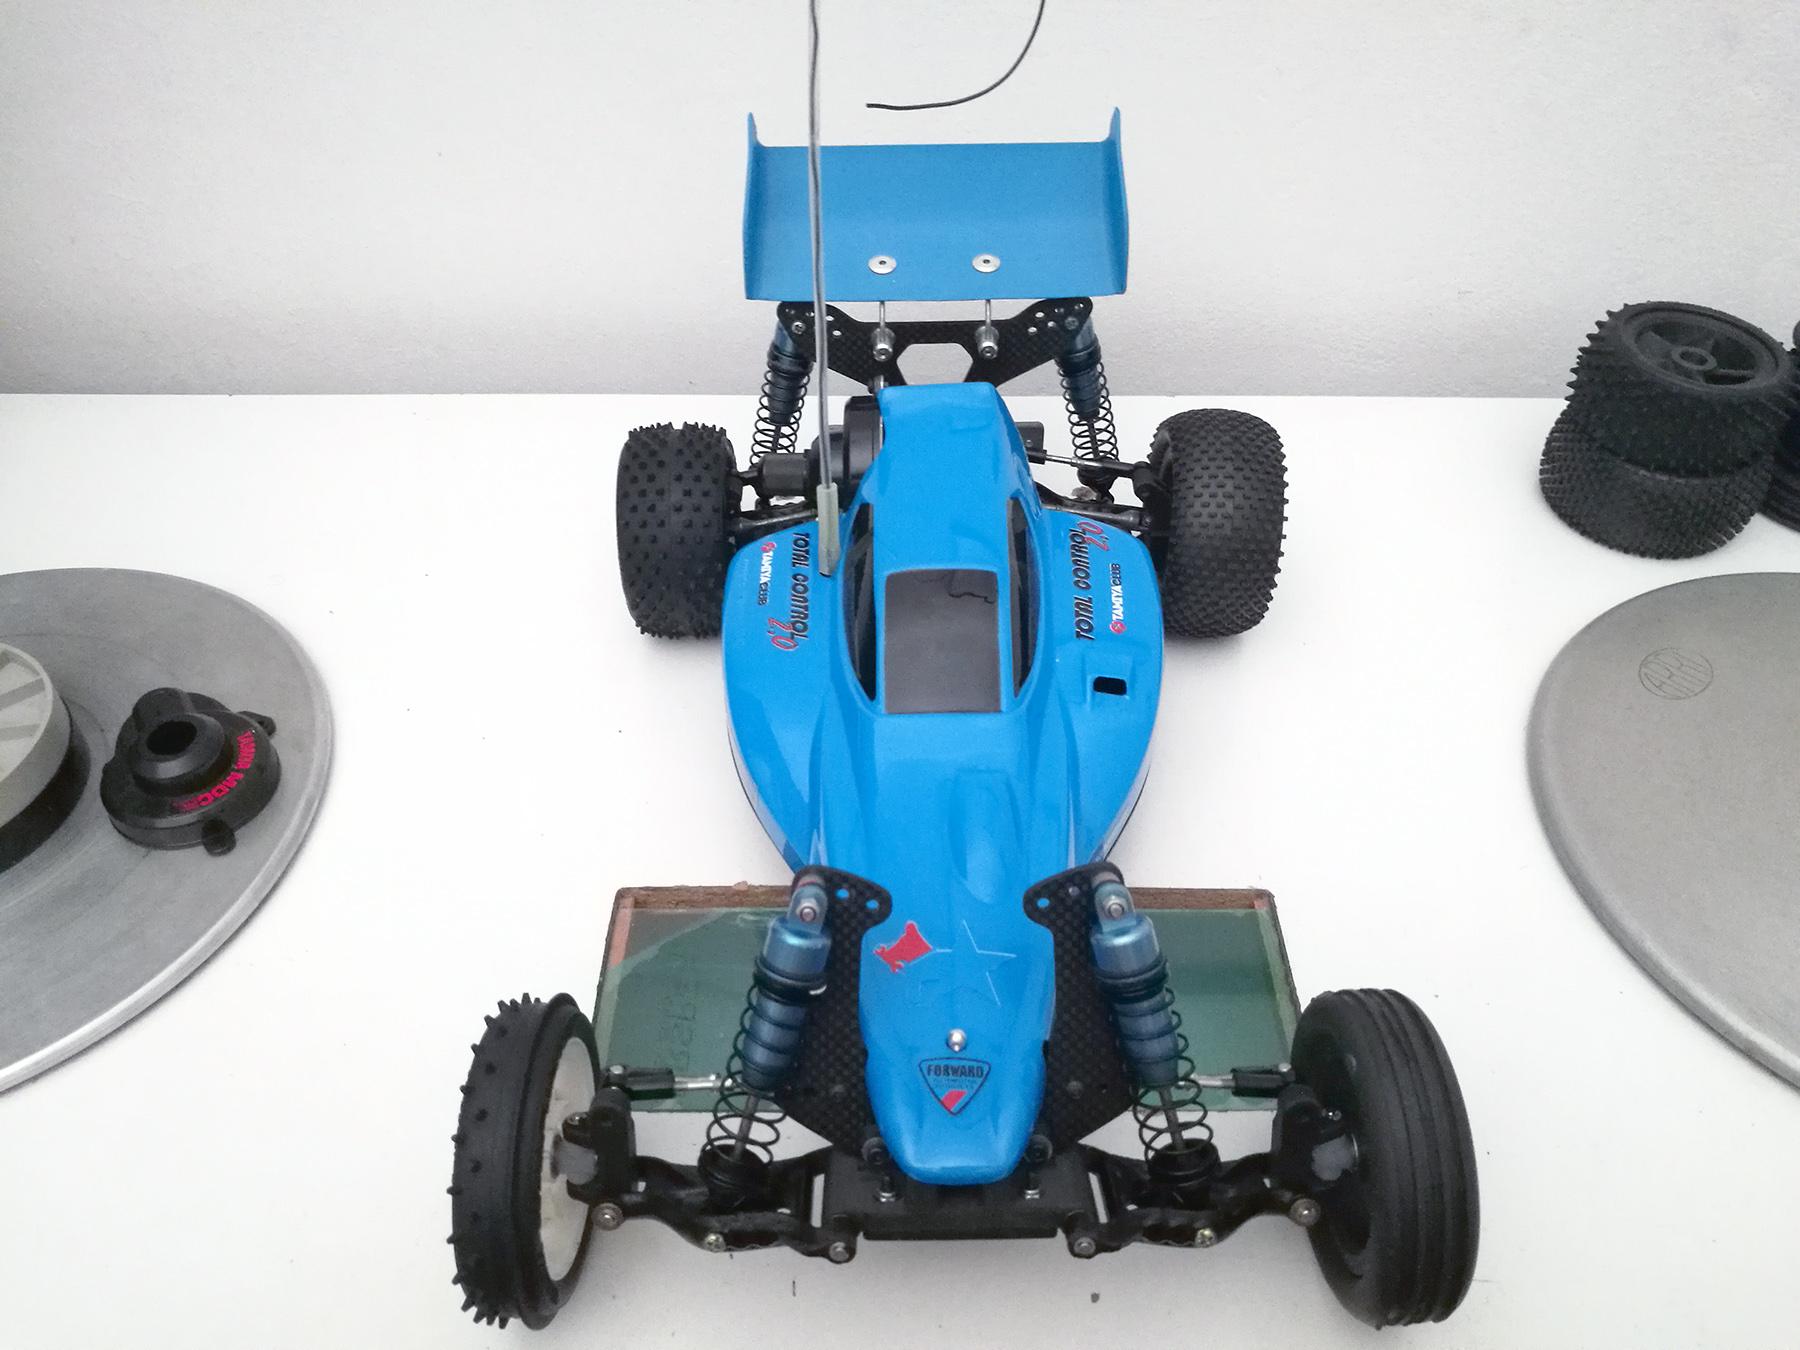 tamiya wrenchdog dyna storm super storm mid motor conversion